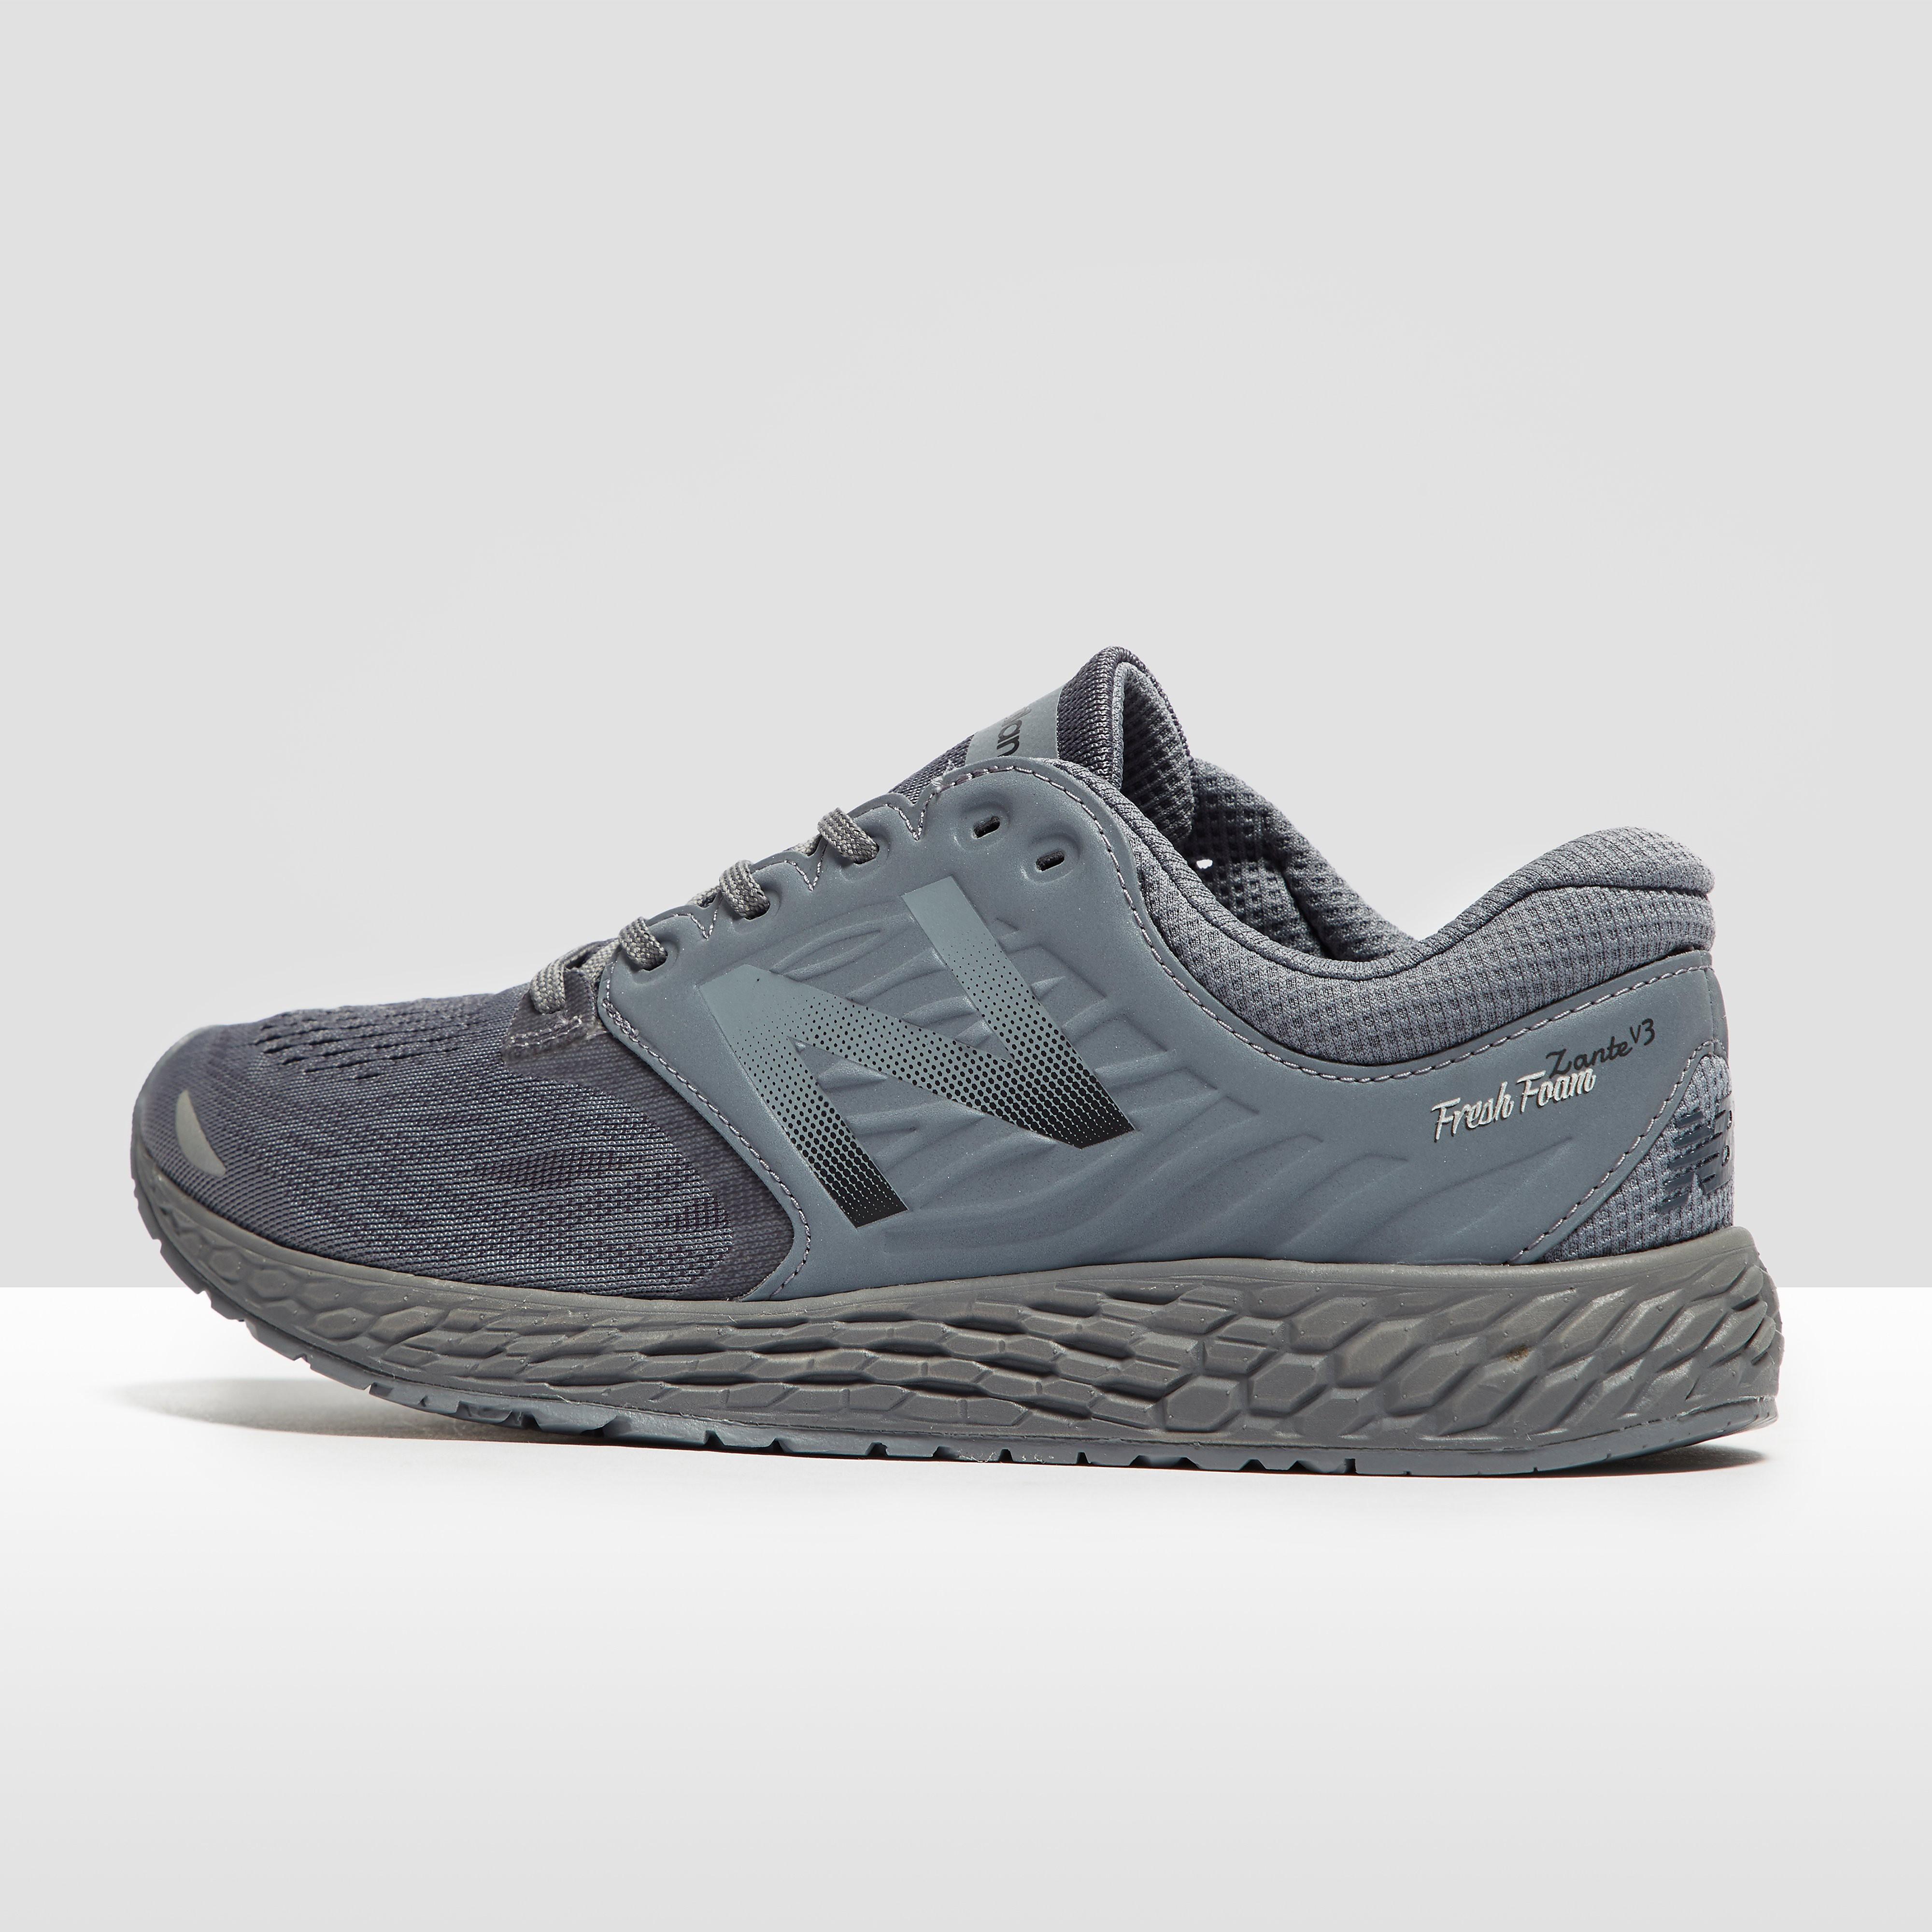 New Balance Fresh Foam Zante V3 Men's Running Shoes